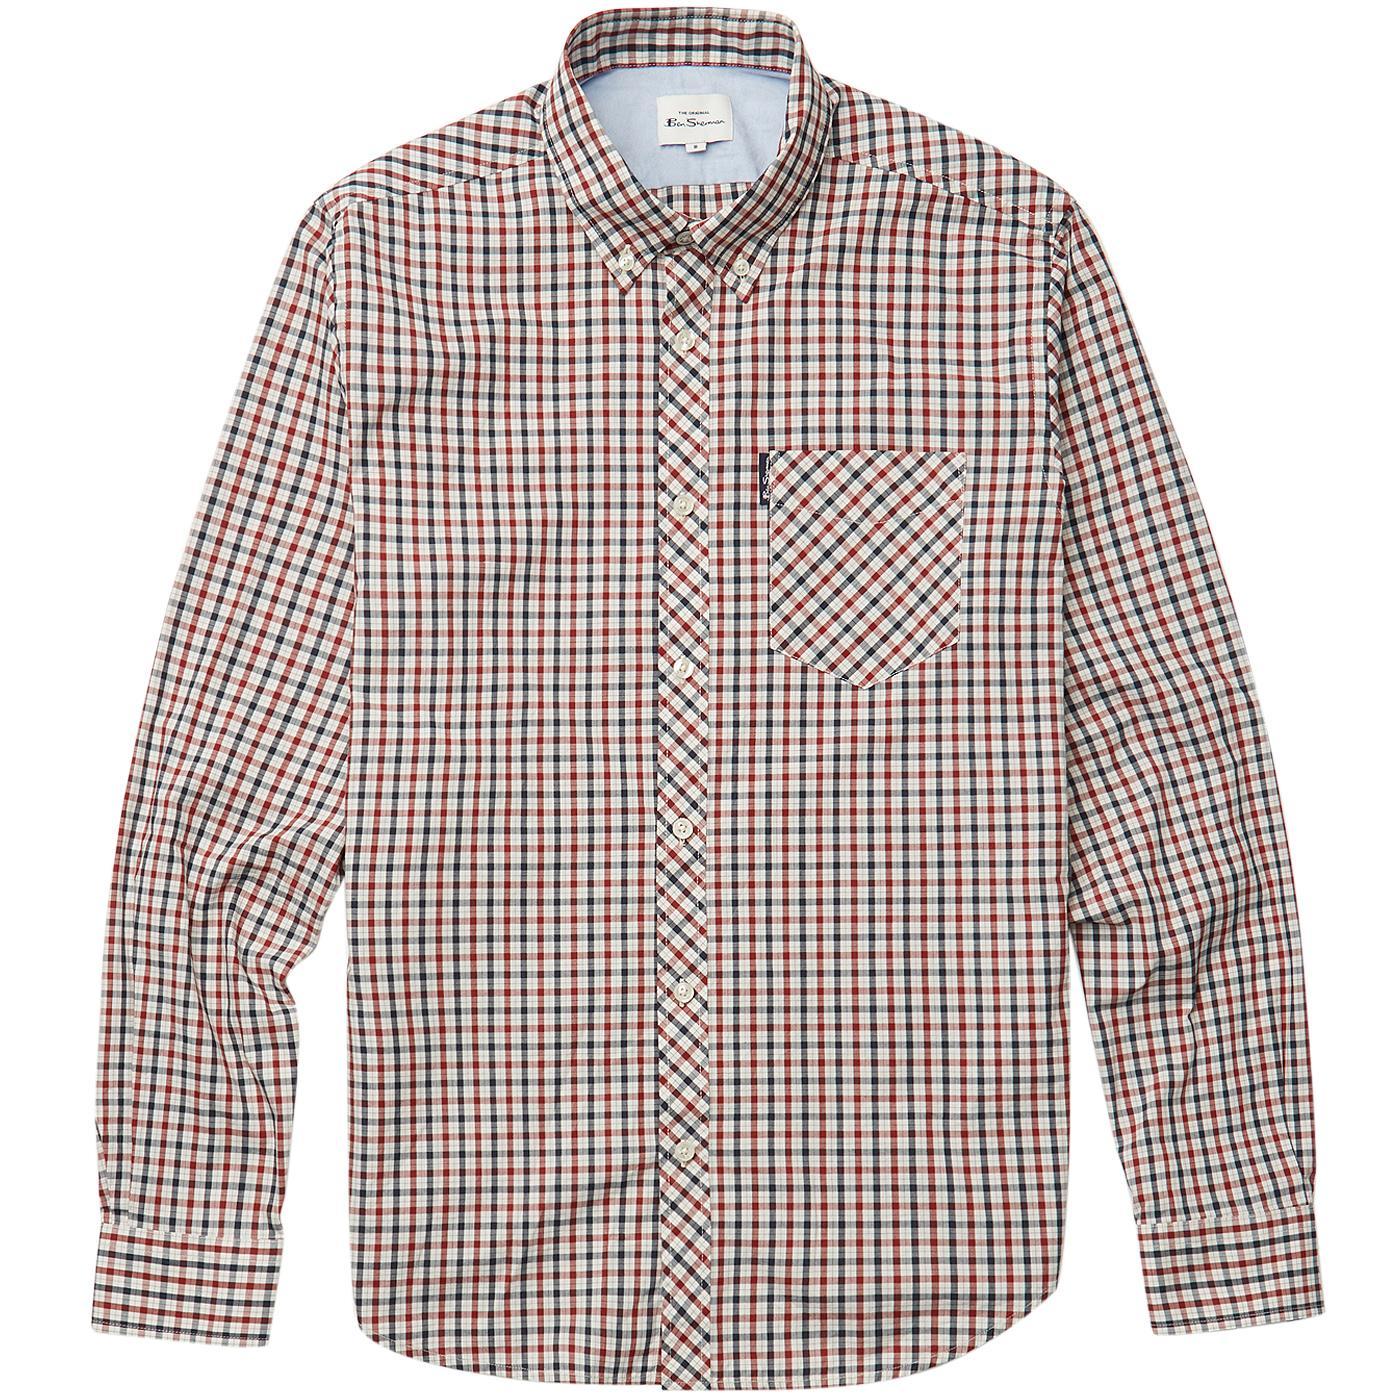 BEN SHERMAN Mod Signature House Check Shirt (Red)